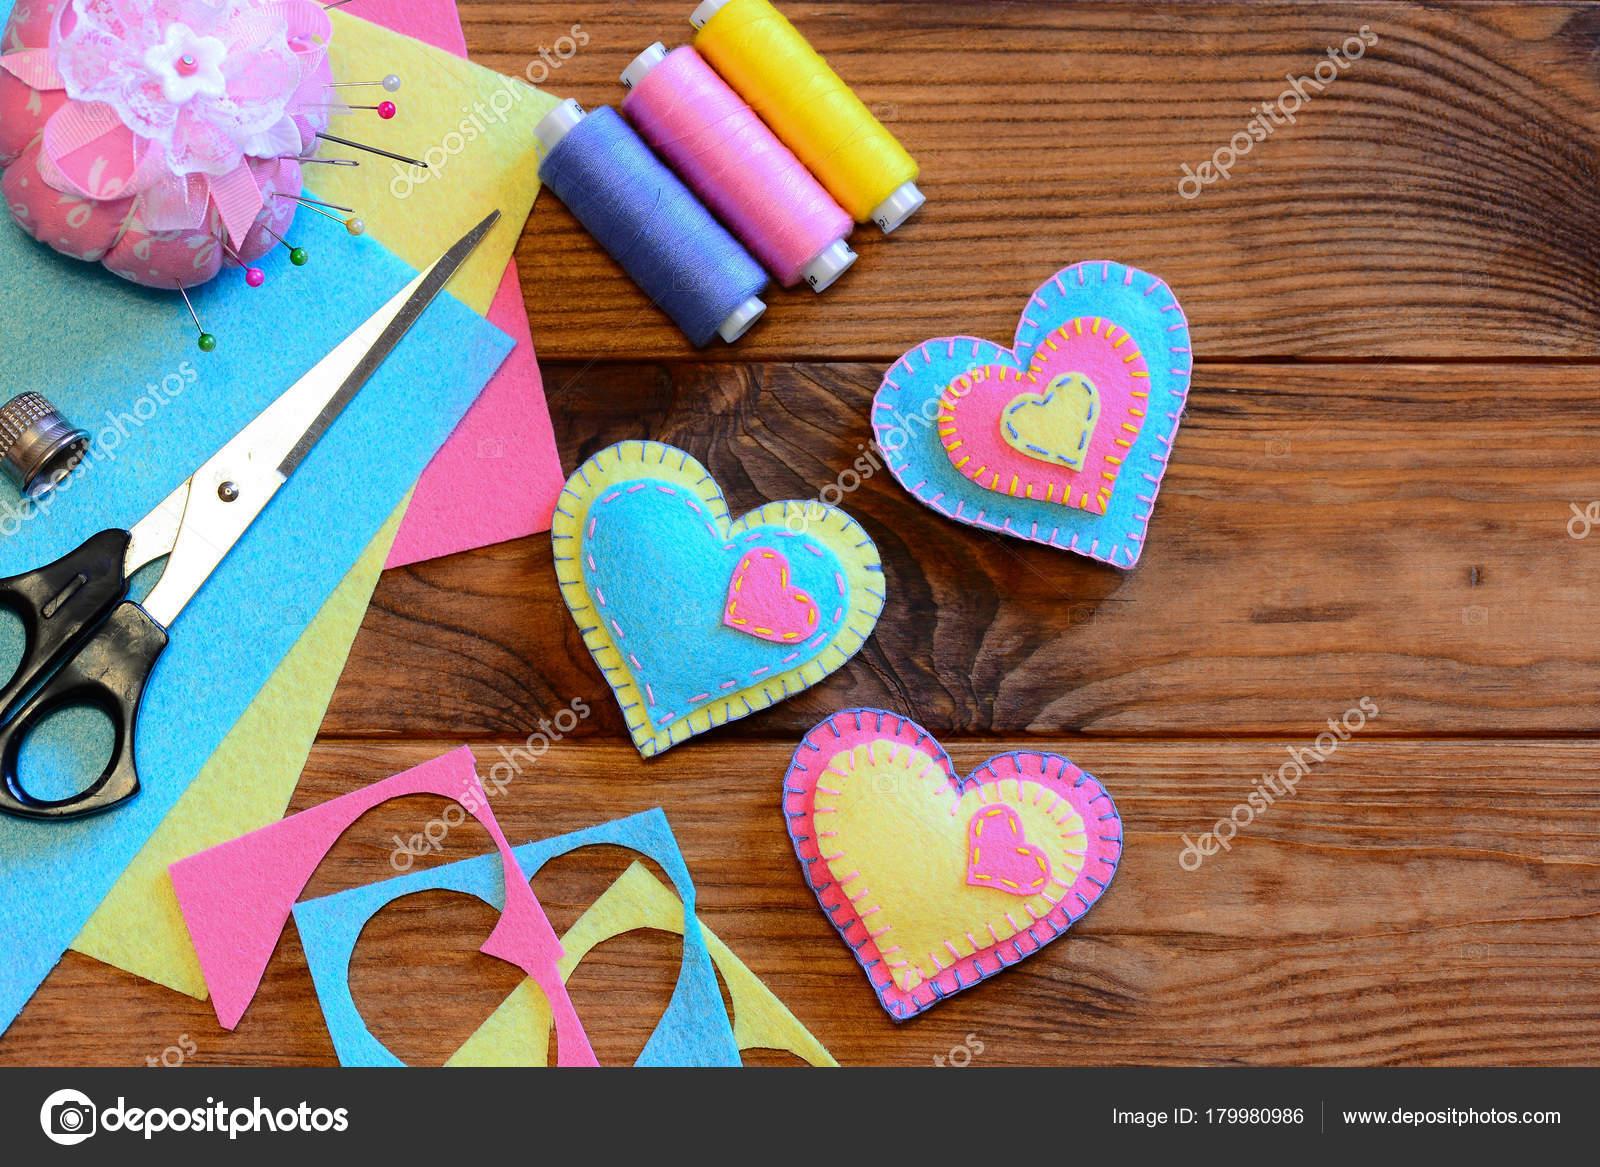 Valentines Day Ornaments Idea Felt Heart Ornaments Scissors Thread